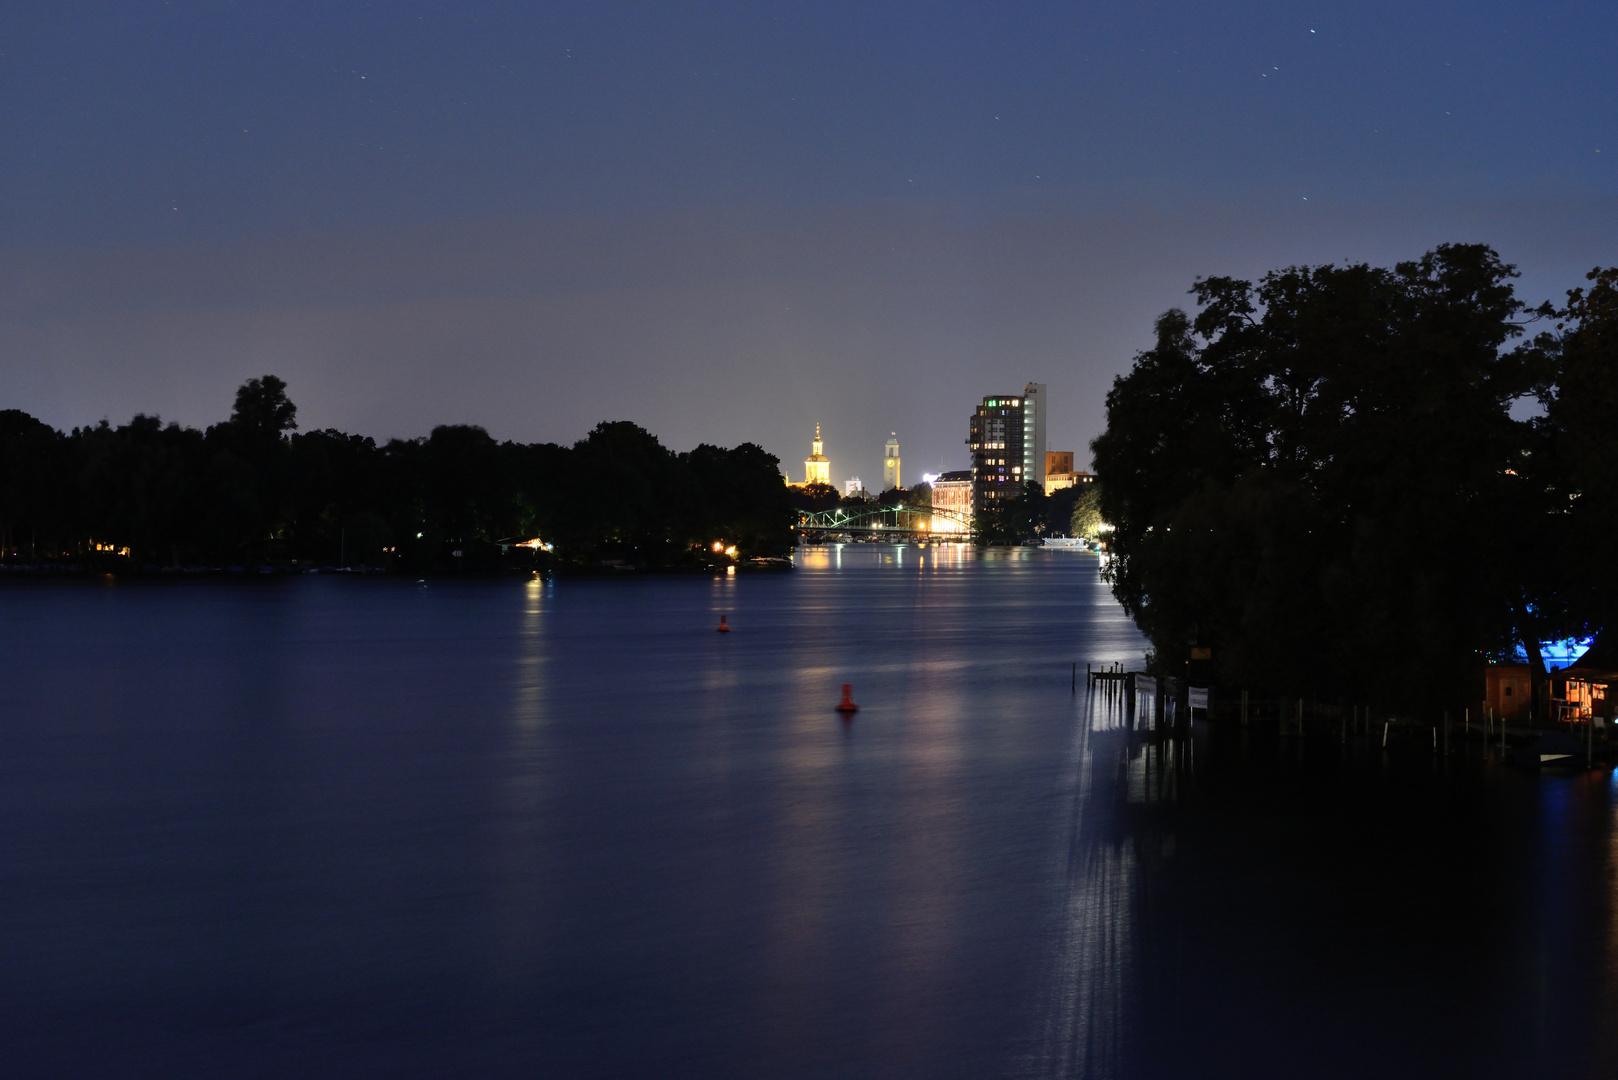 Berlin Spandau bei Nacht